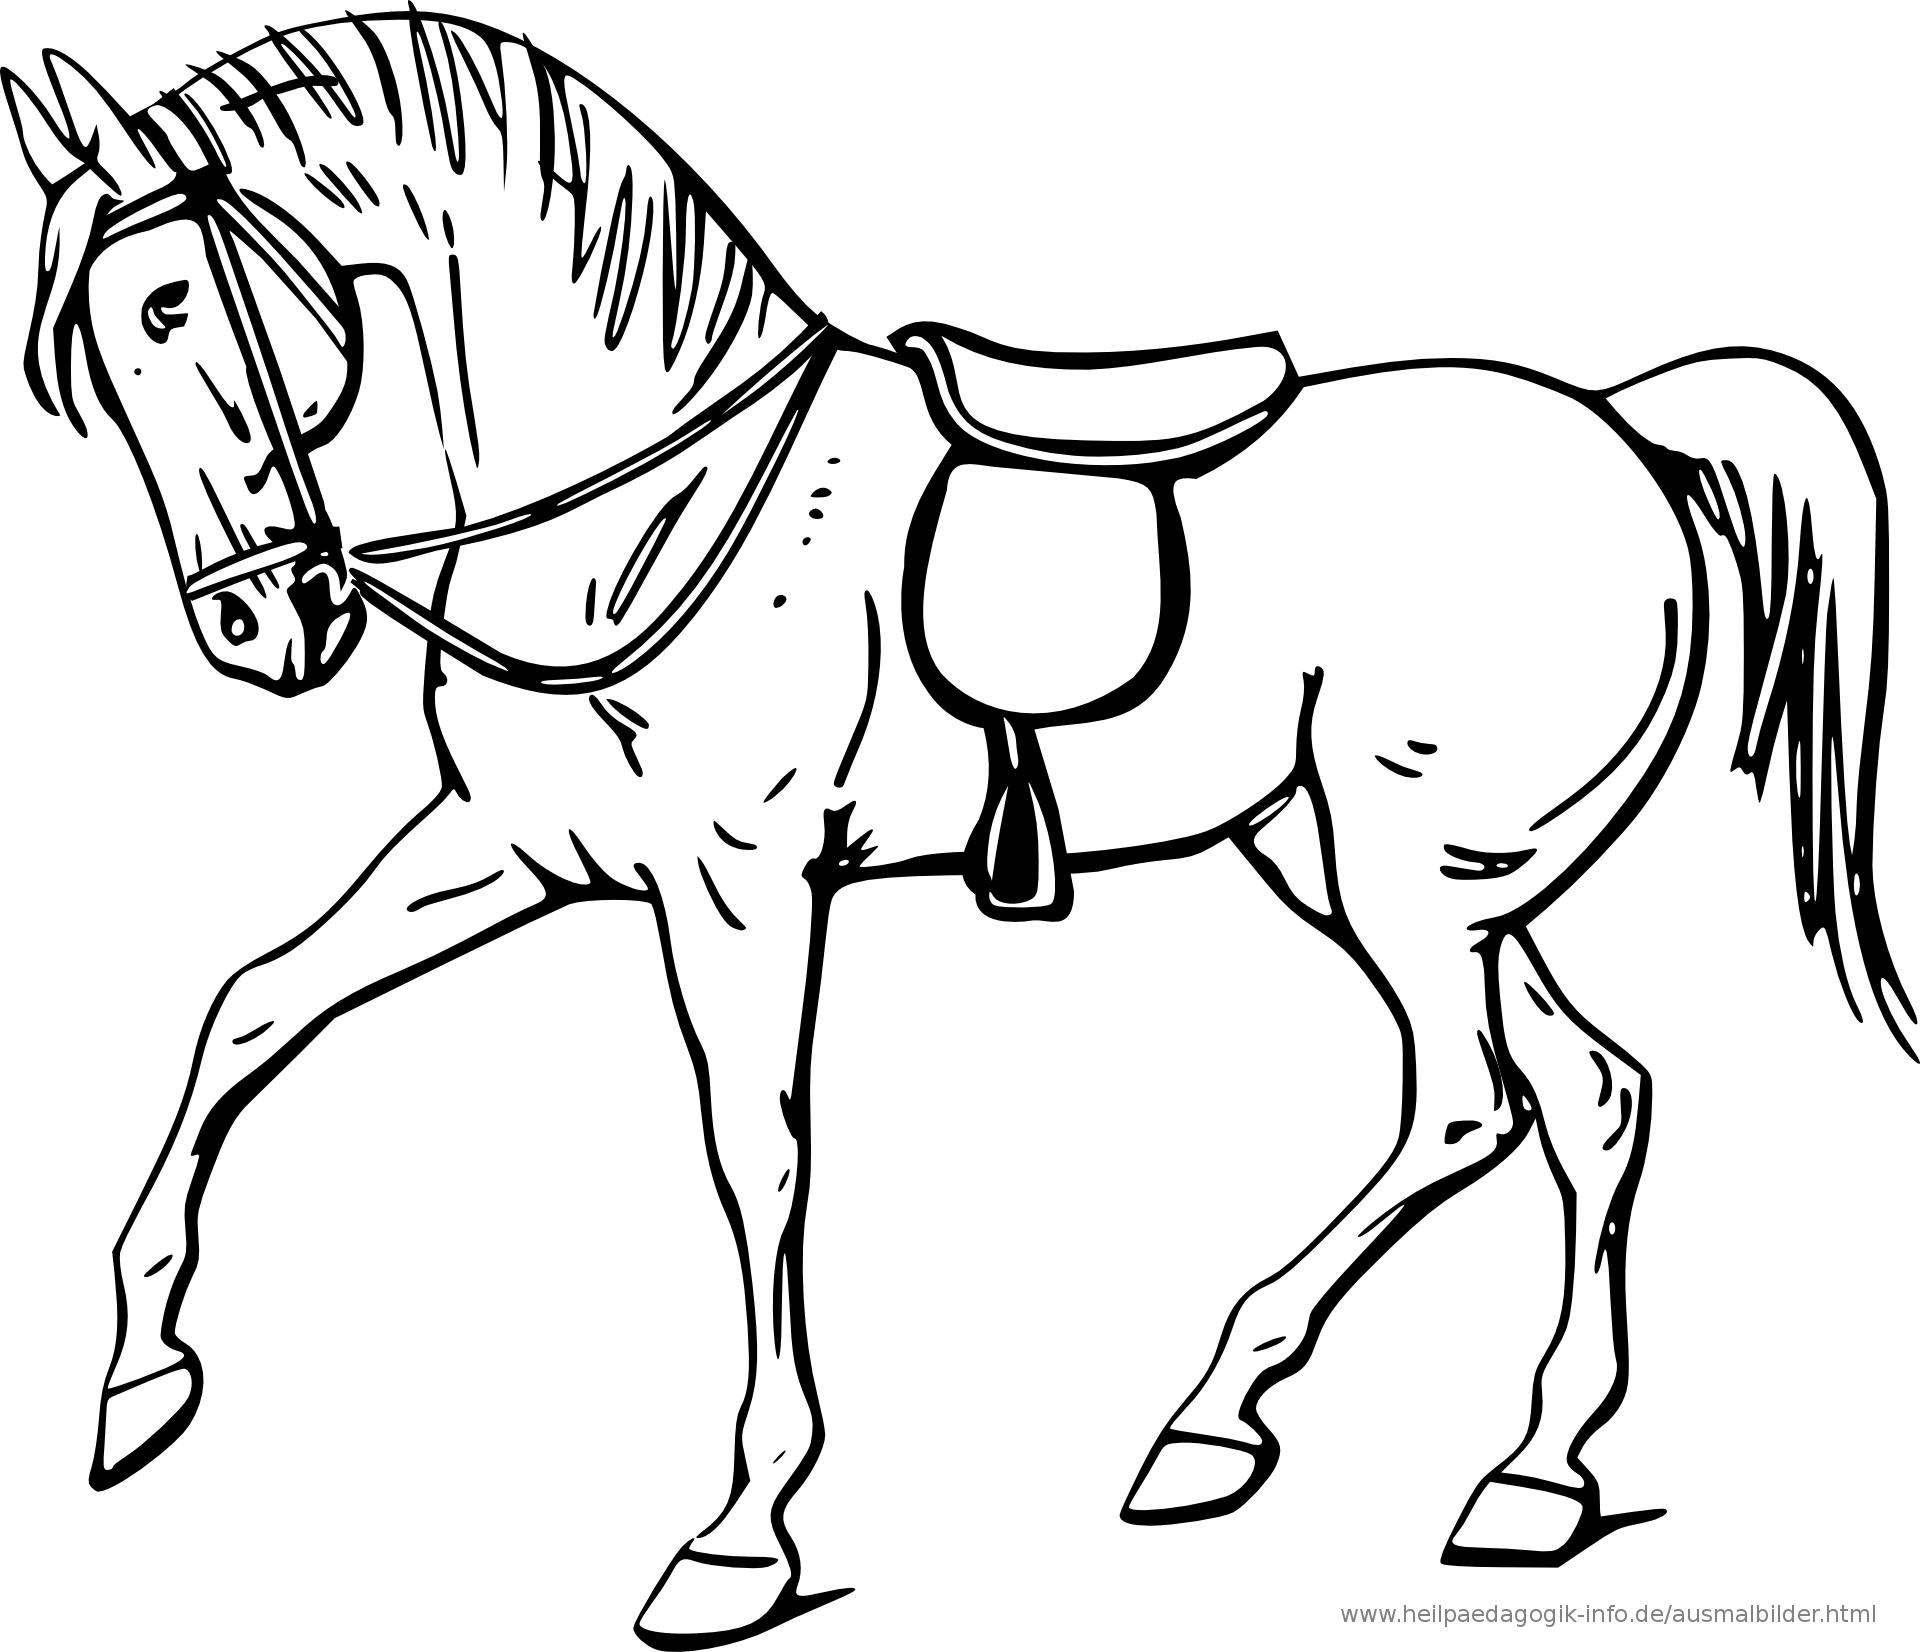 PNG Pferdekopf Kostenlos - 72431